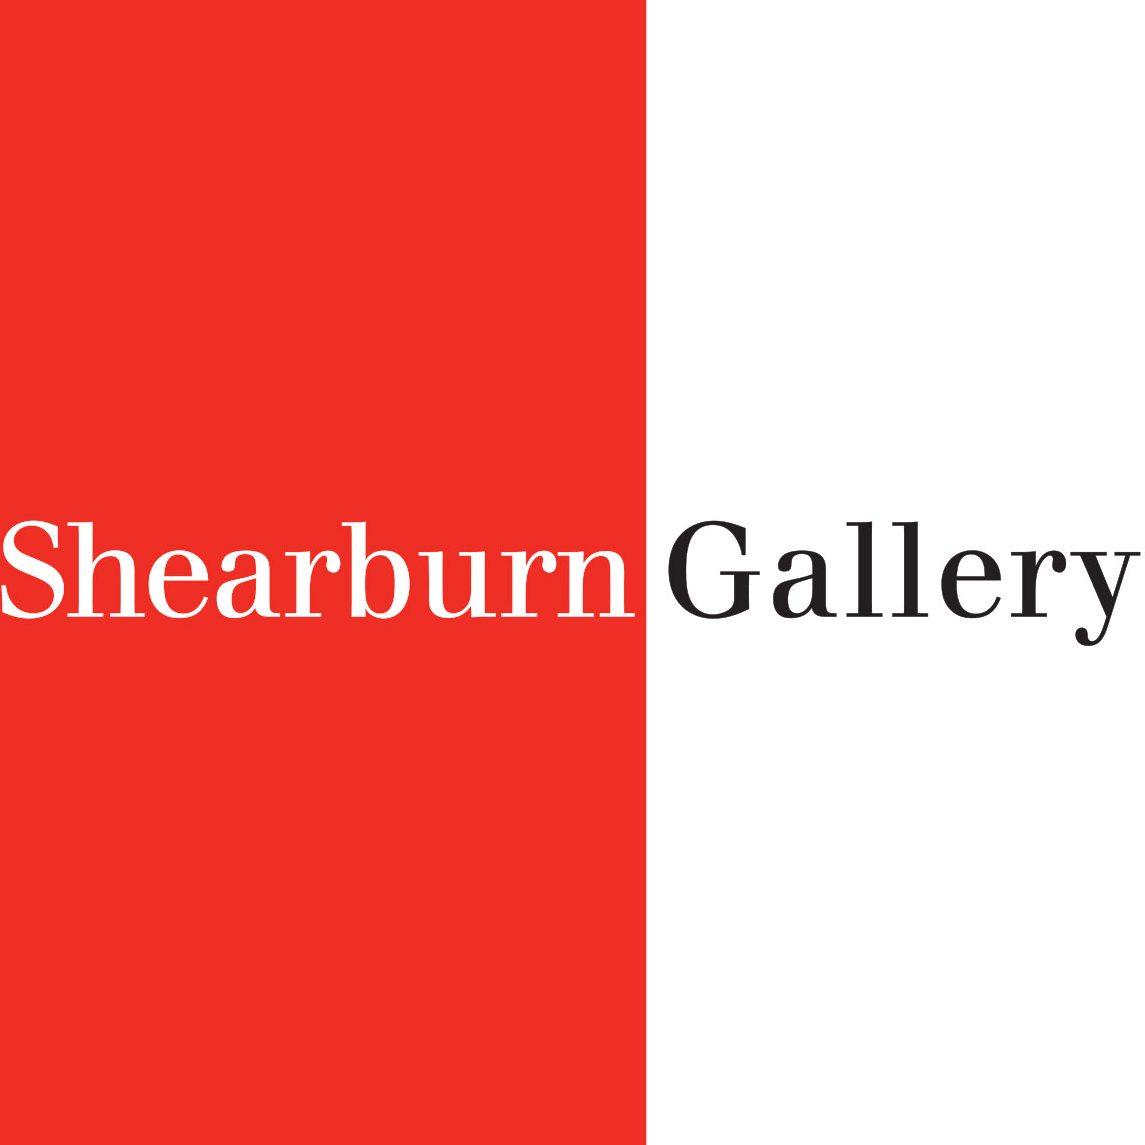 William Shearburn Gallery